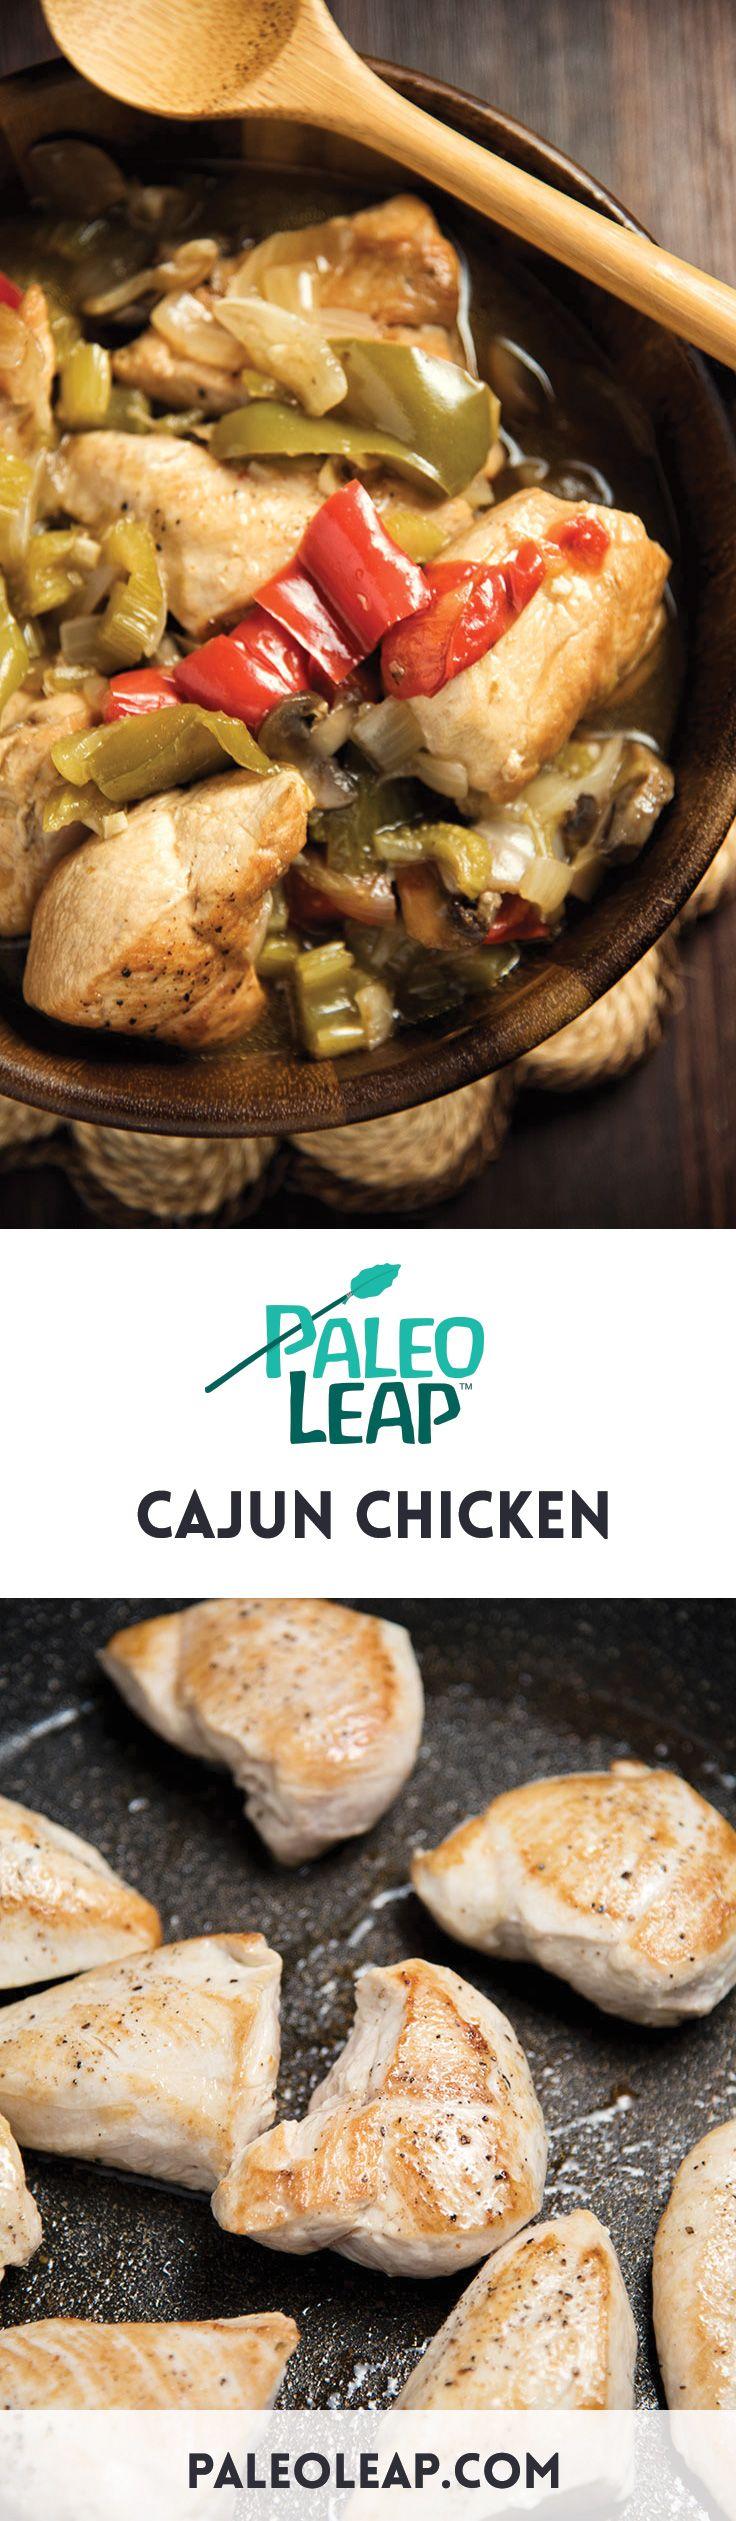 Cajun Chicken With Mushrooms #Paleo